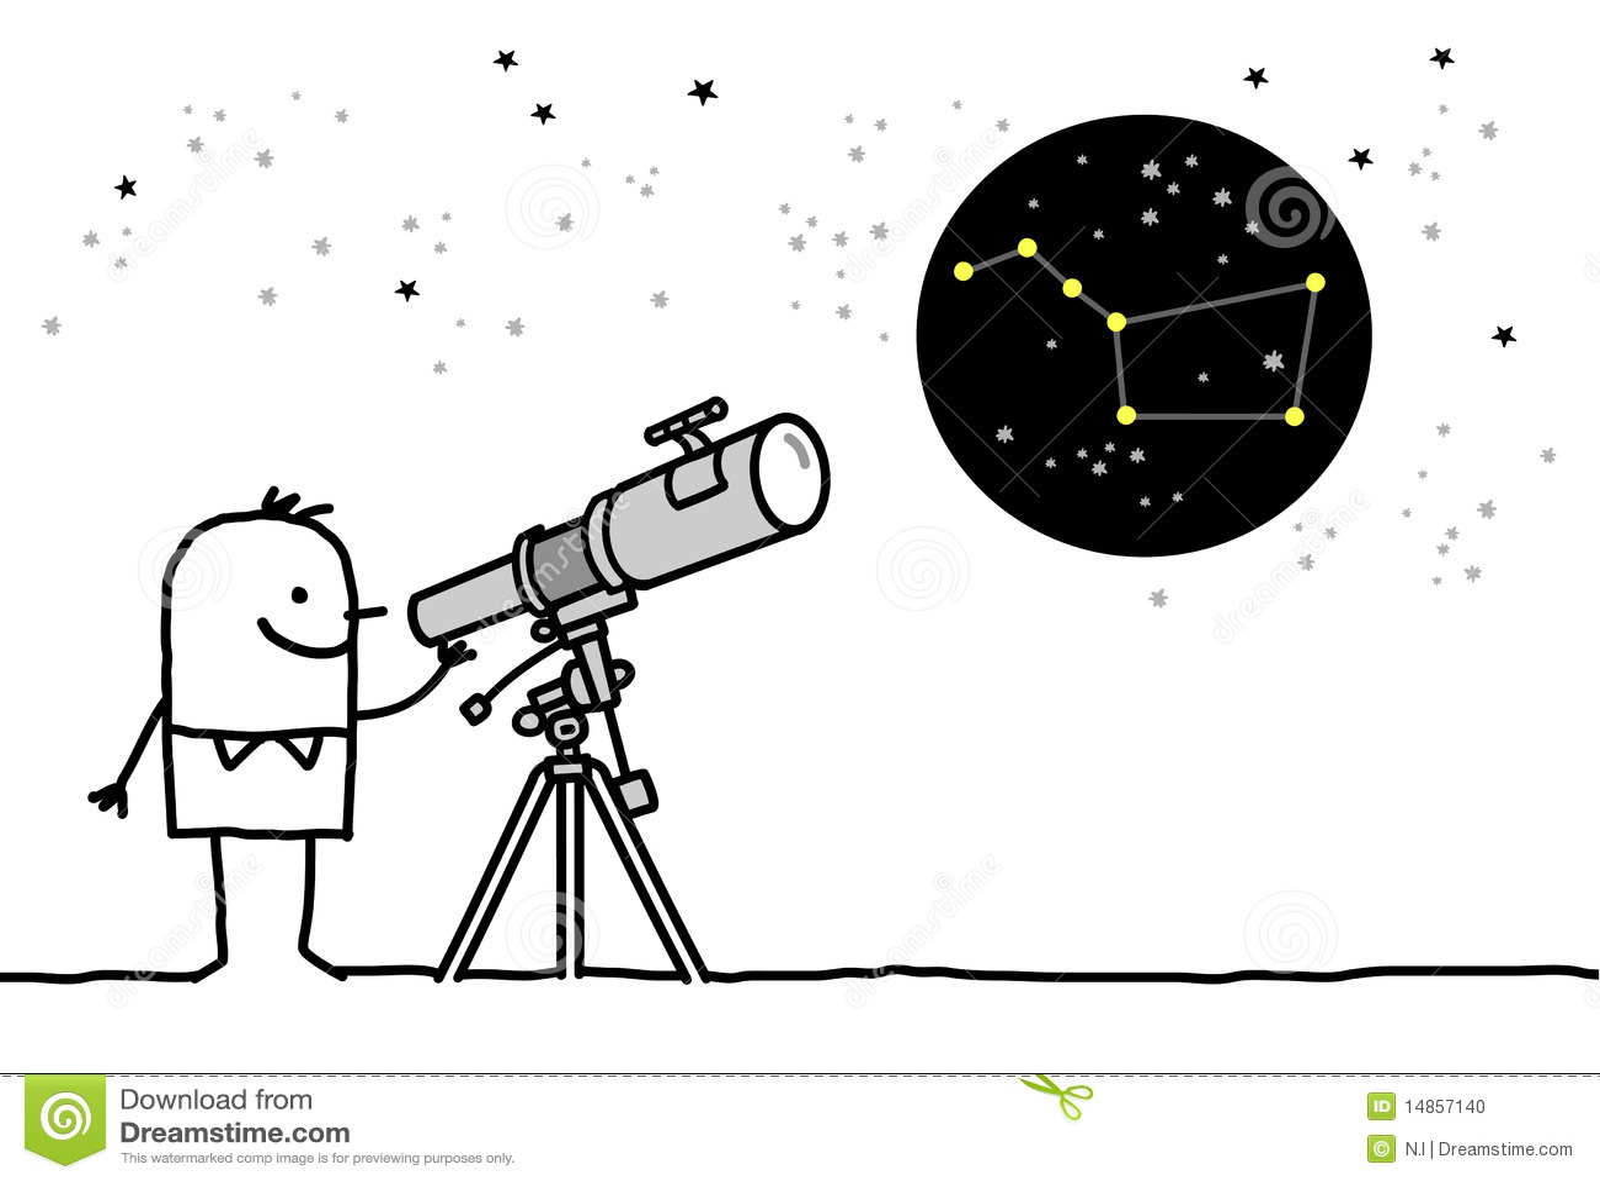 Telescope & constellation